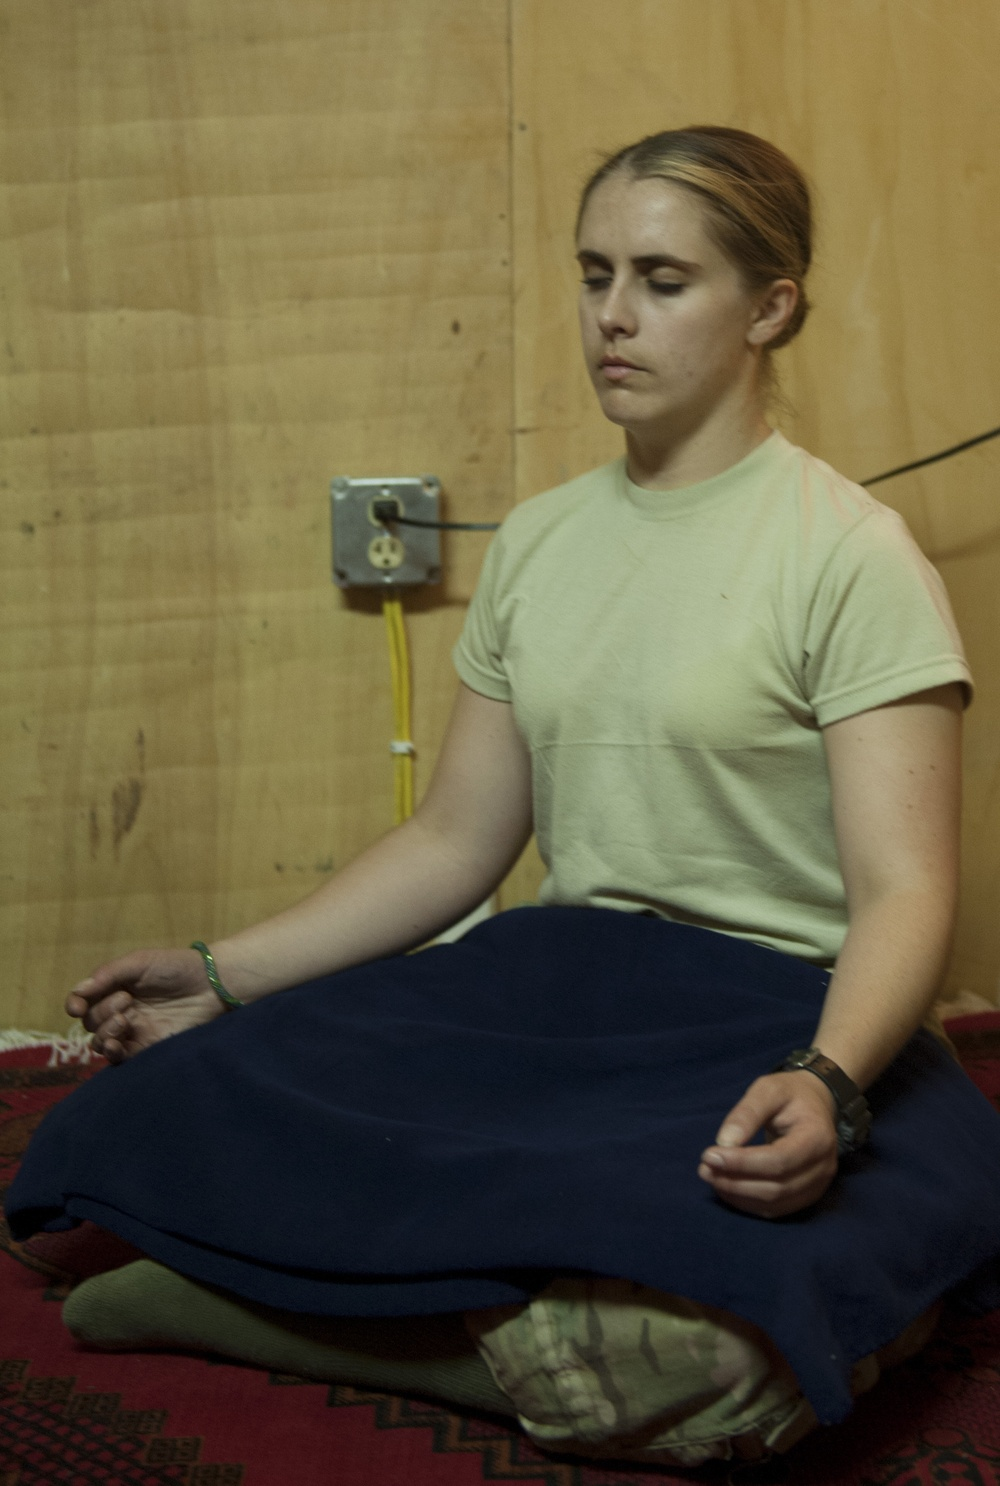 Meditation and healing combats stress